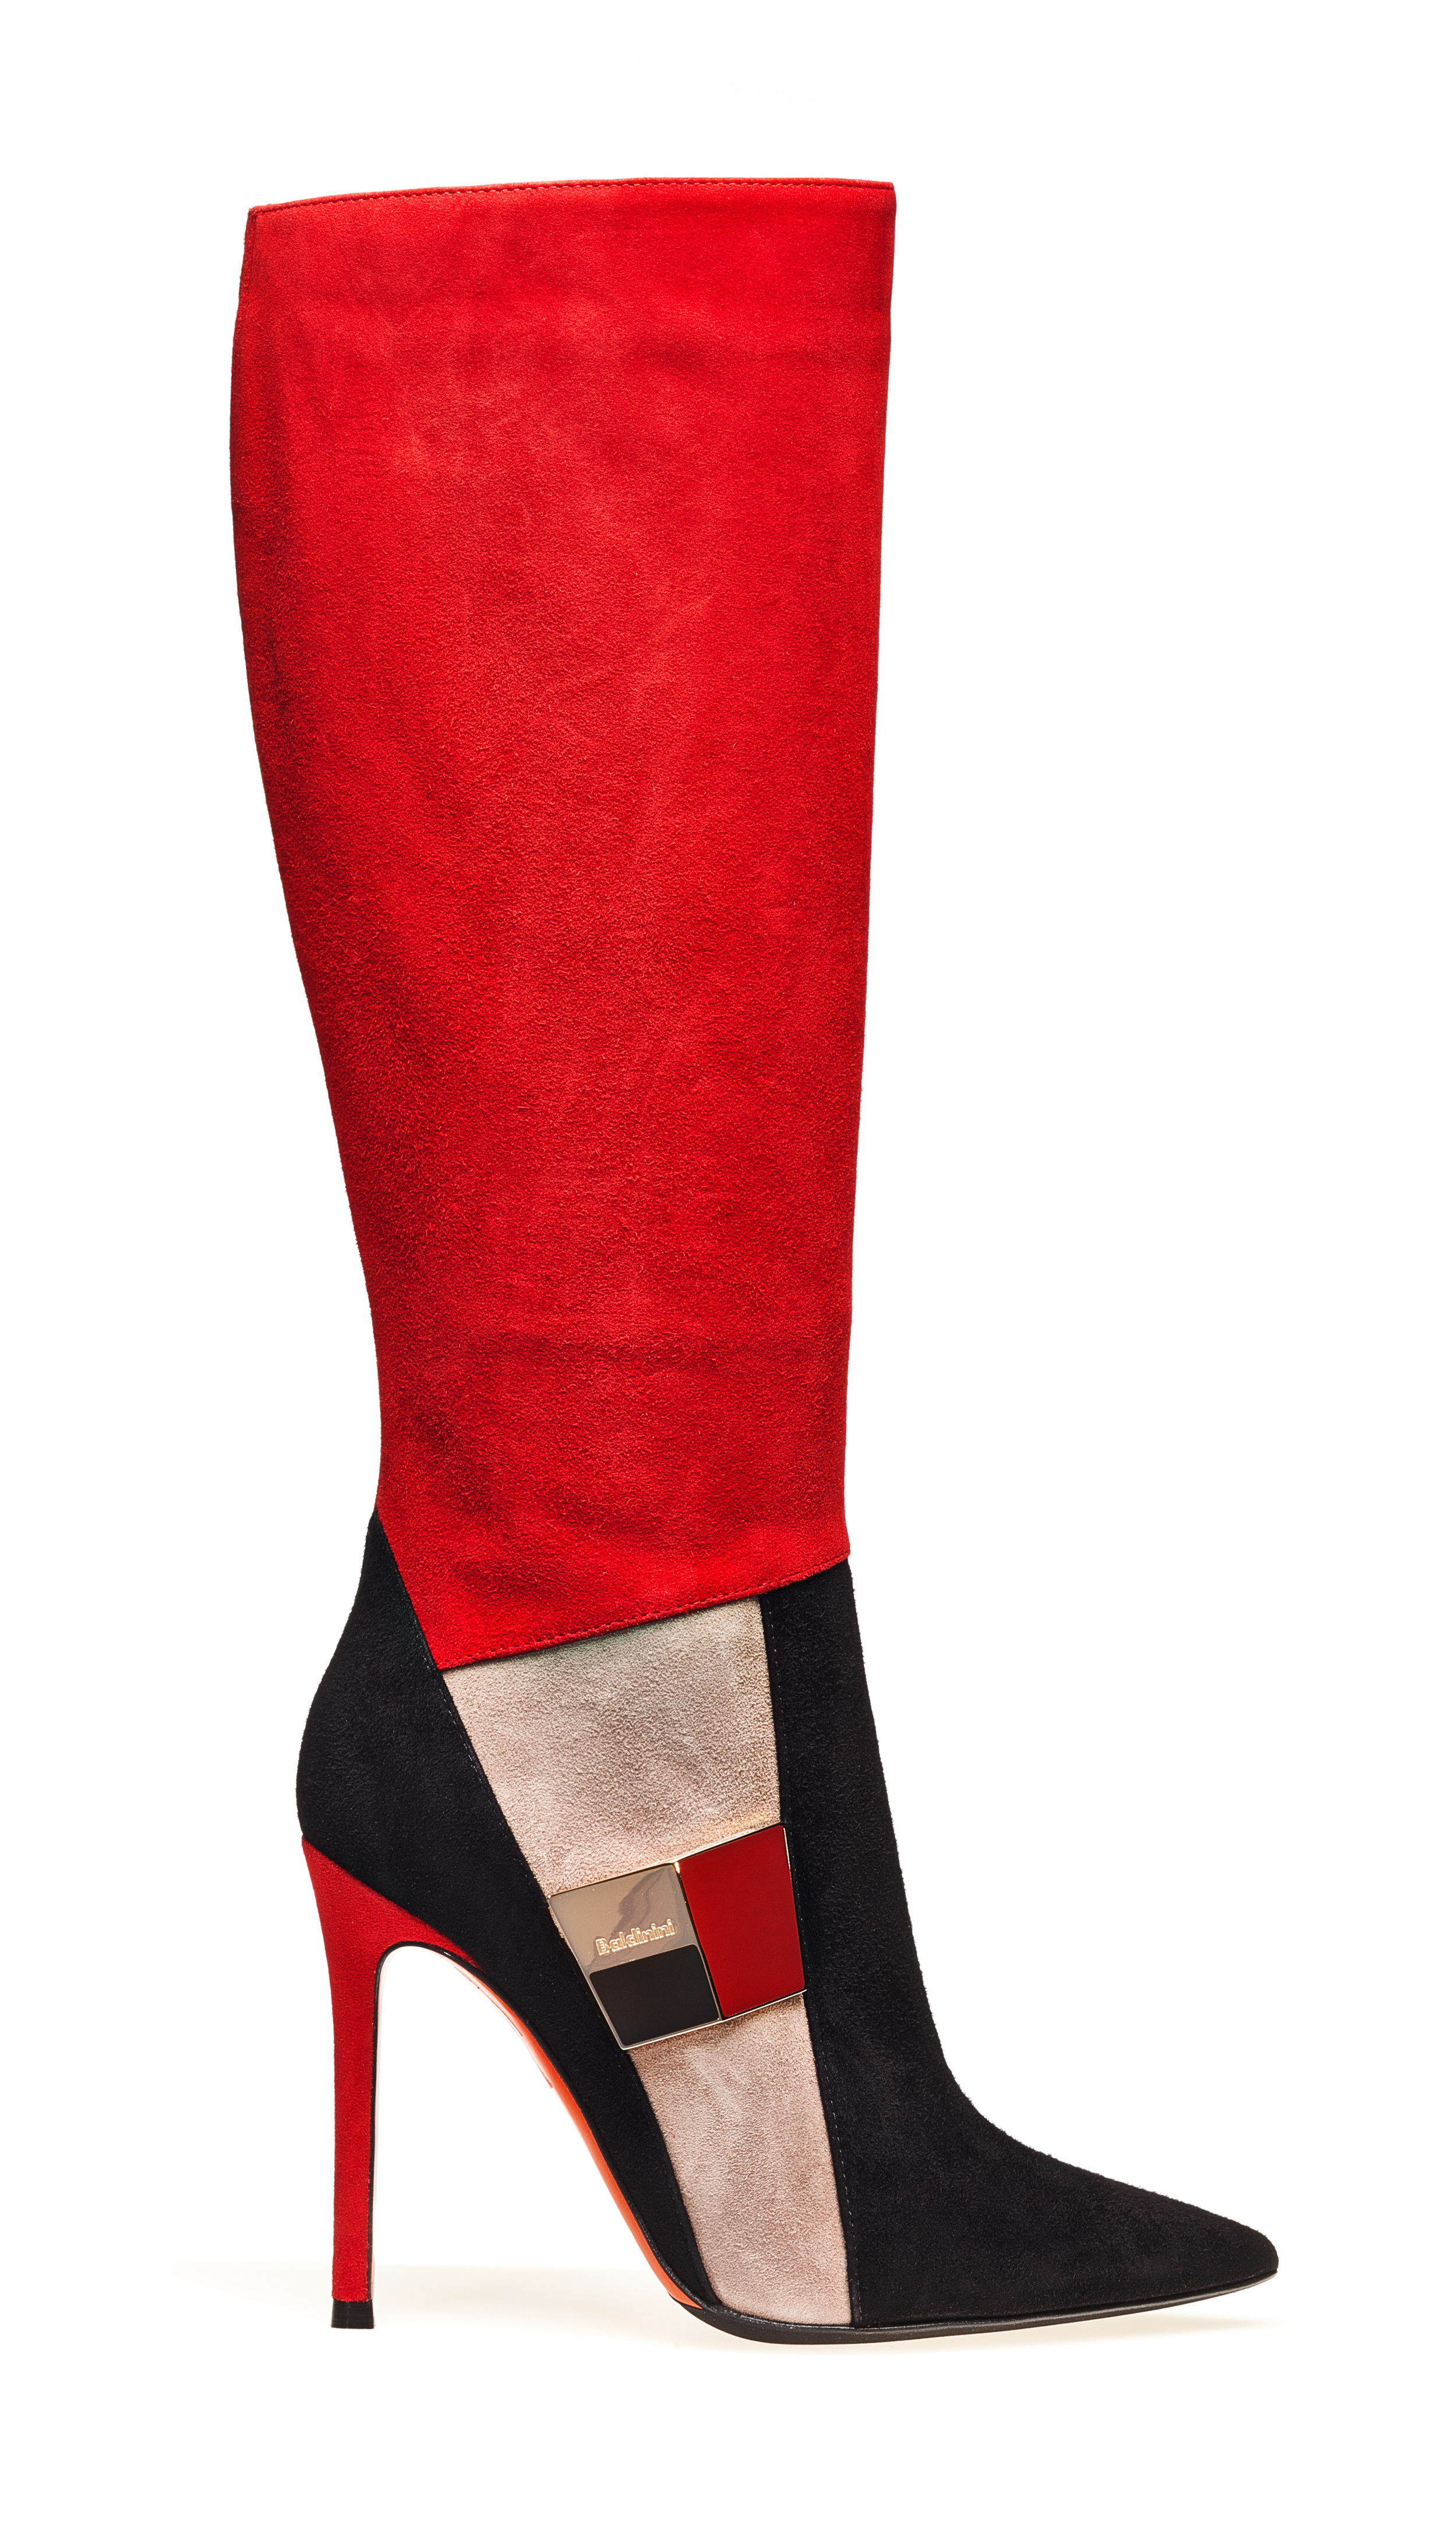 P & K Freisteller HW 2015 Baldinini Stiefel 935 EUR